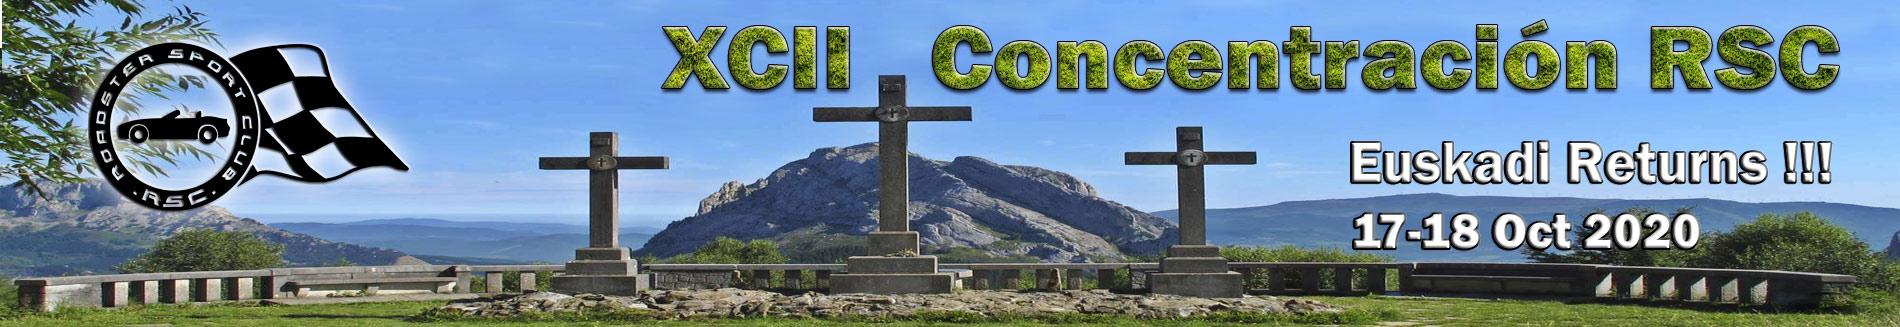 XCII Concentración: Euskadi Returns!!!